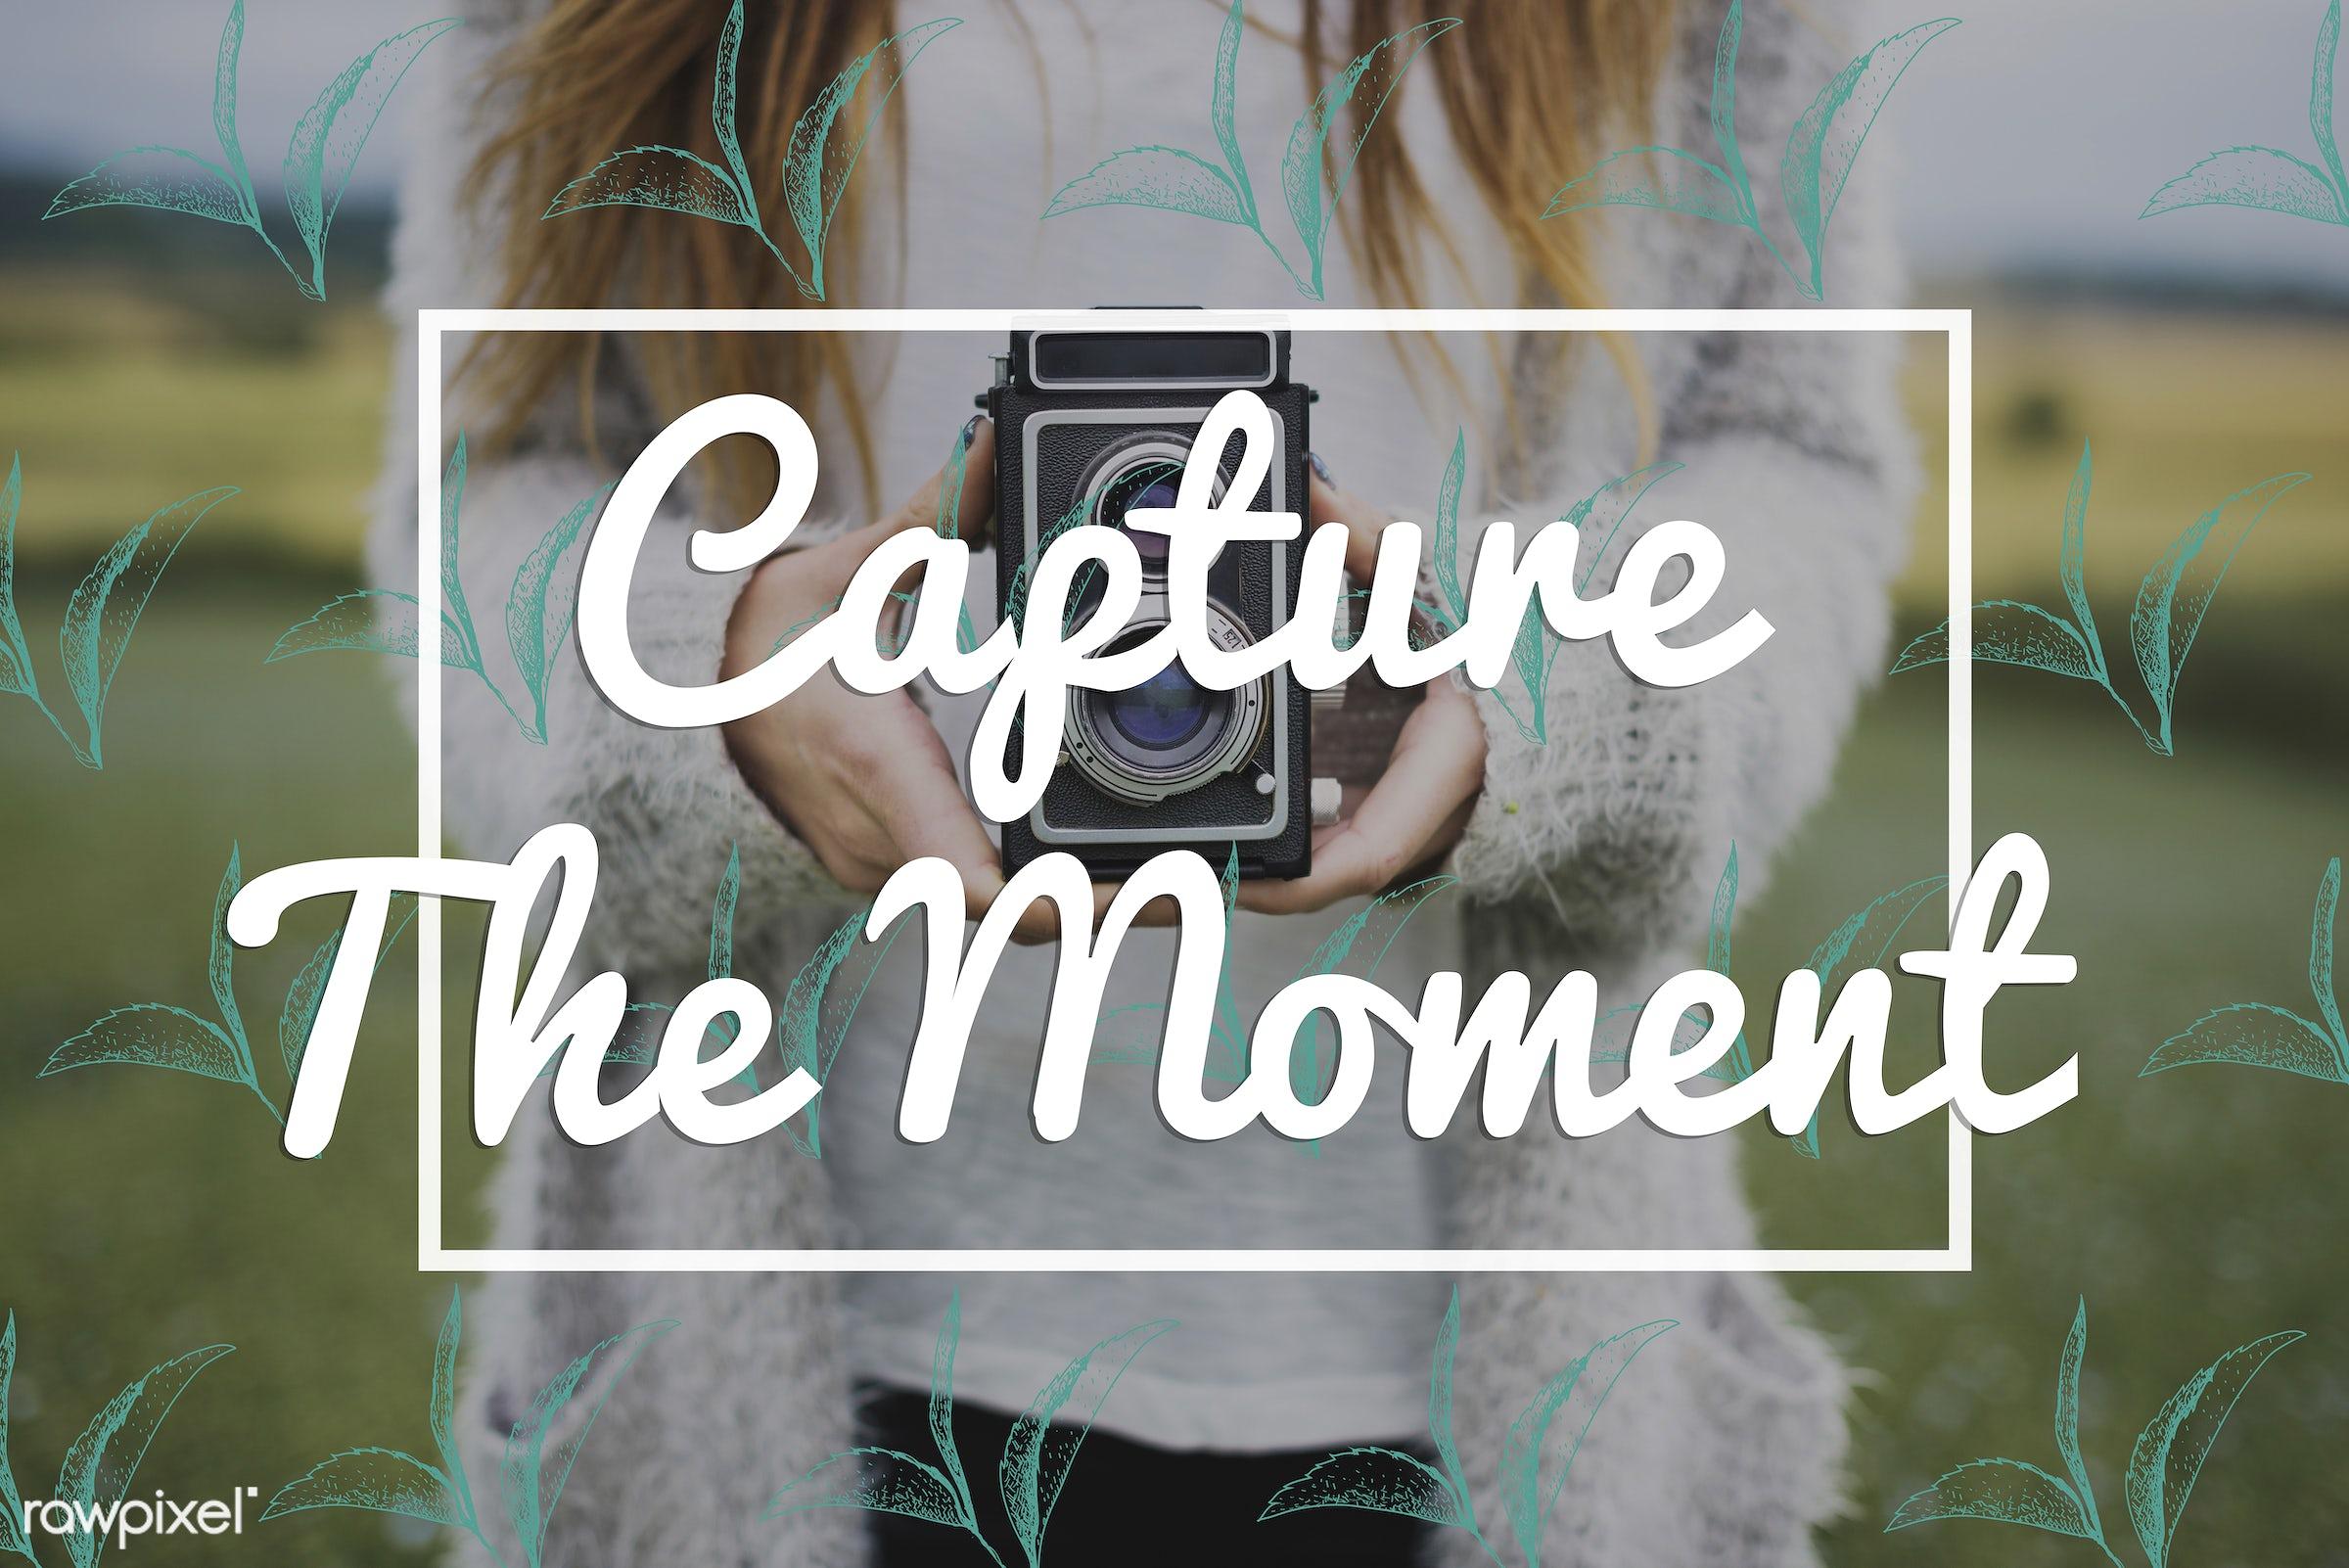 camera, capture, caucasian, cold, dark blonde, female, feminine, grass, hands, hobby, holding, journalism, land, leisure,...